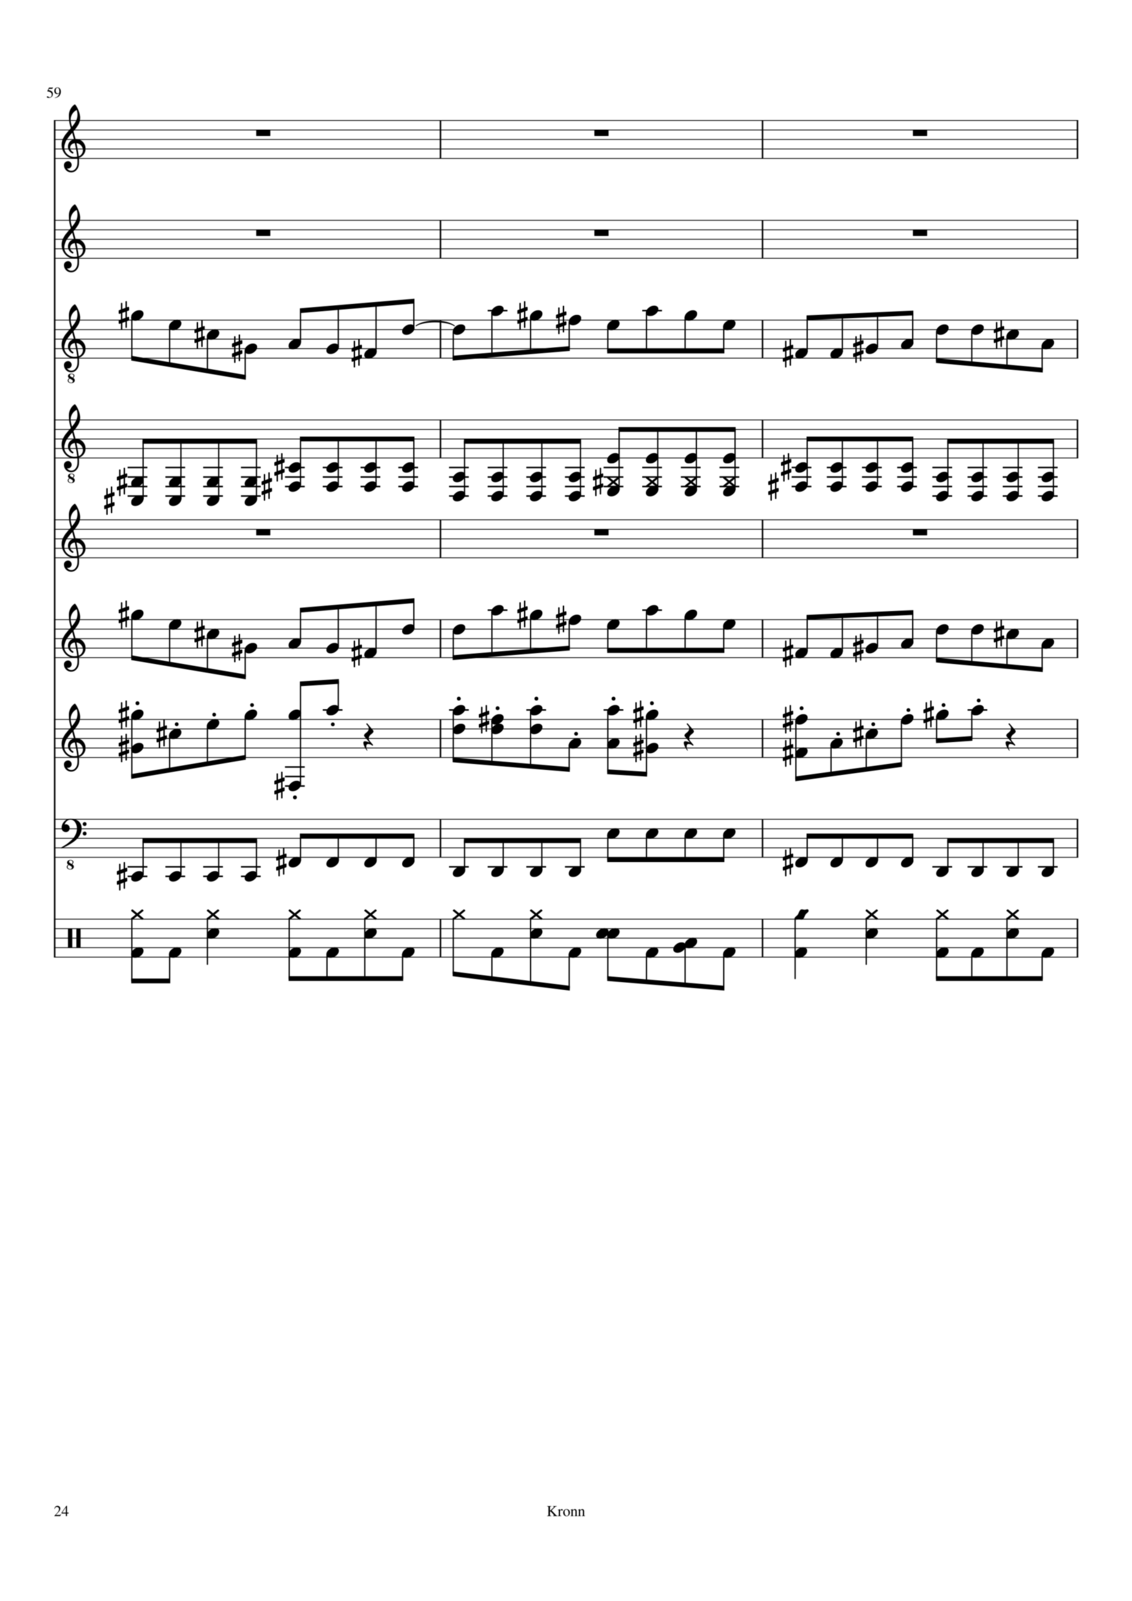 Ispoved Pervogo Boga slide, Image 24